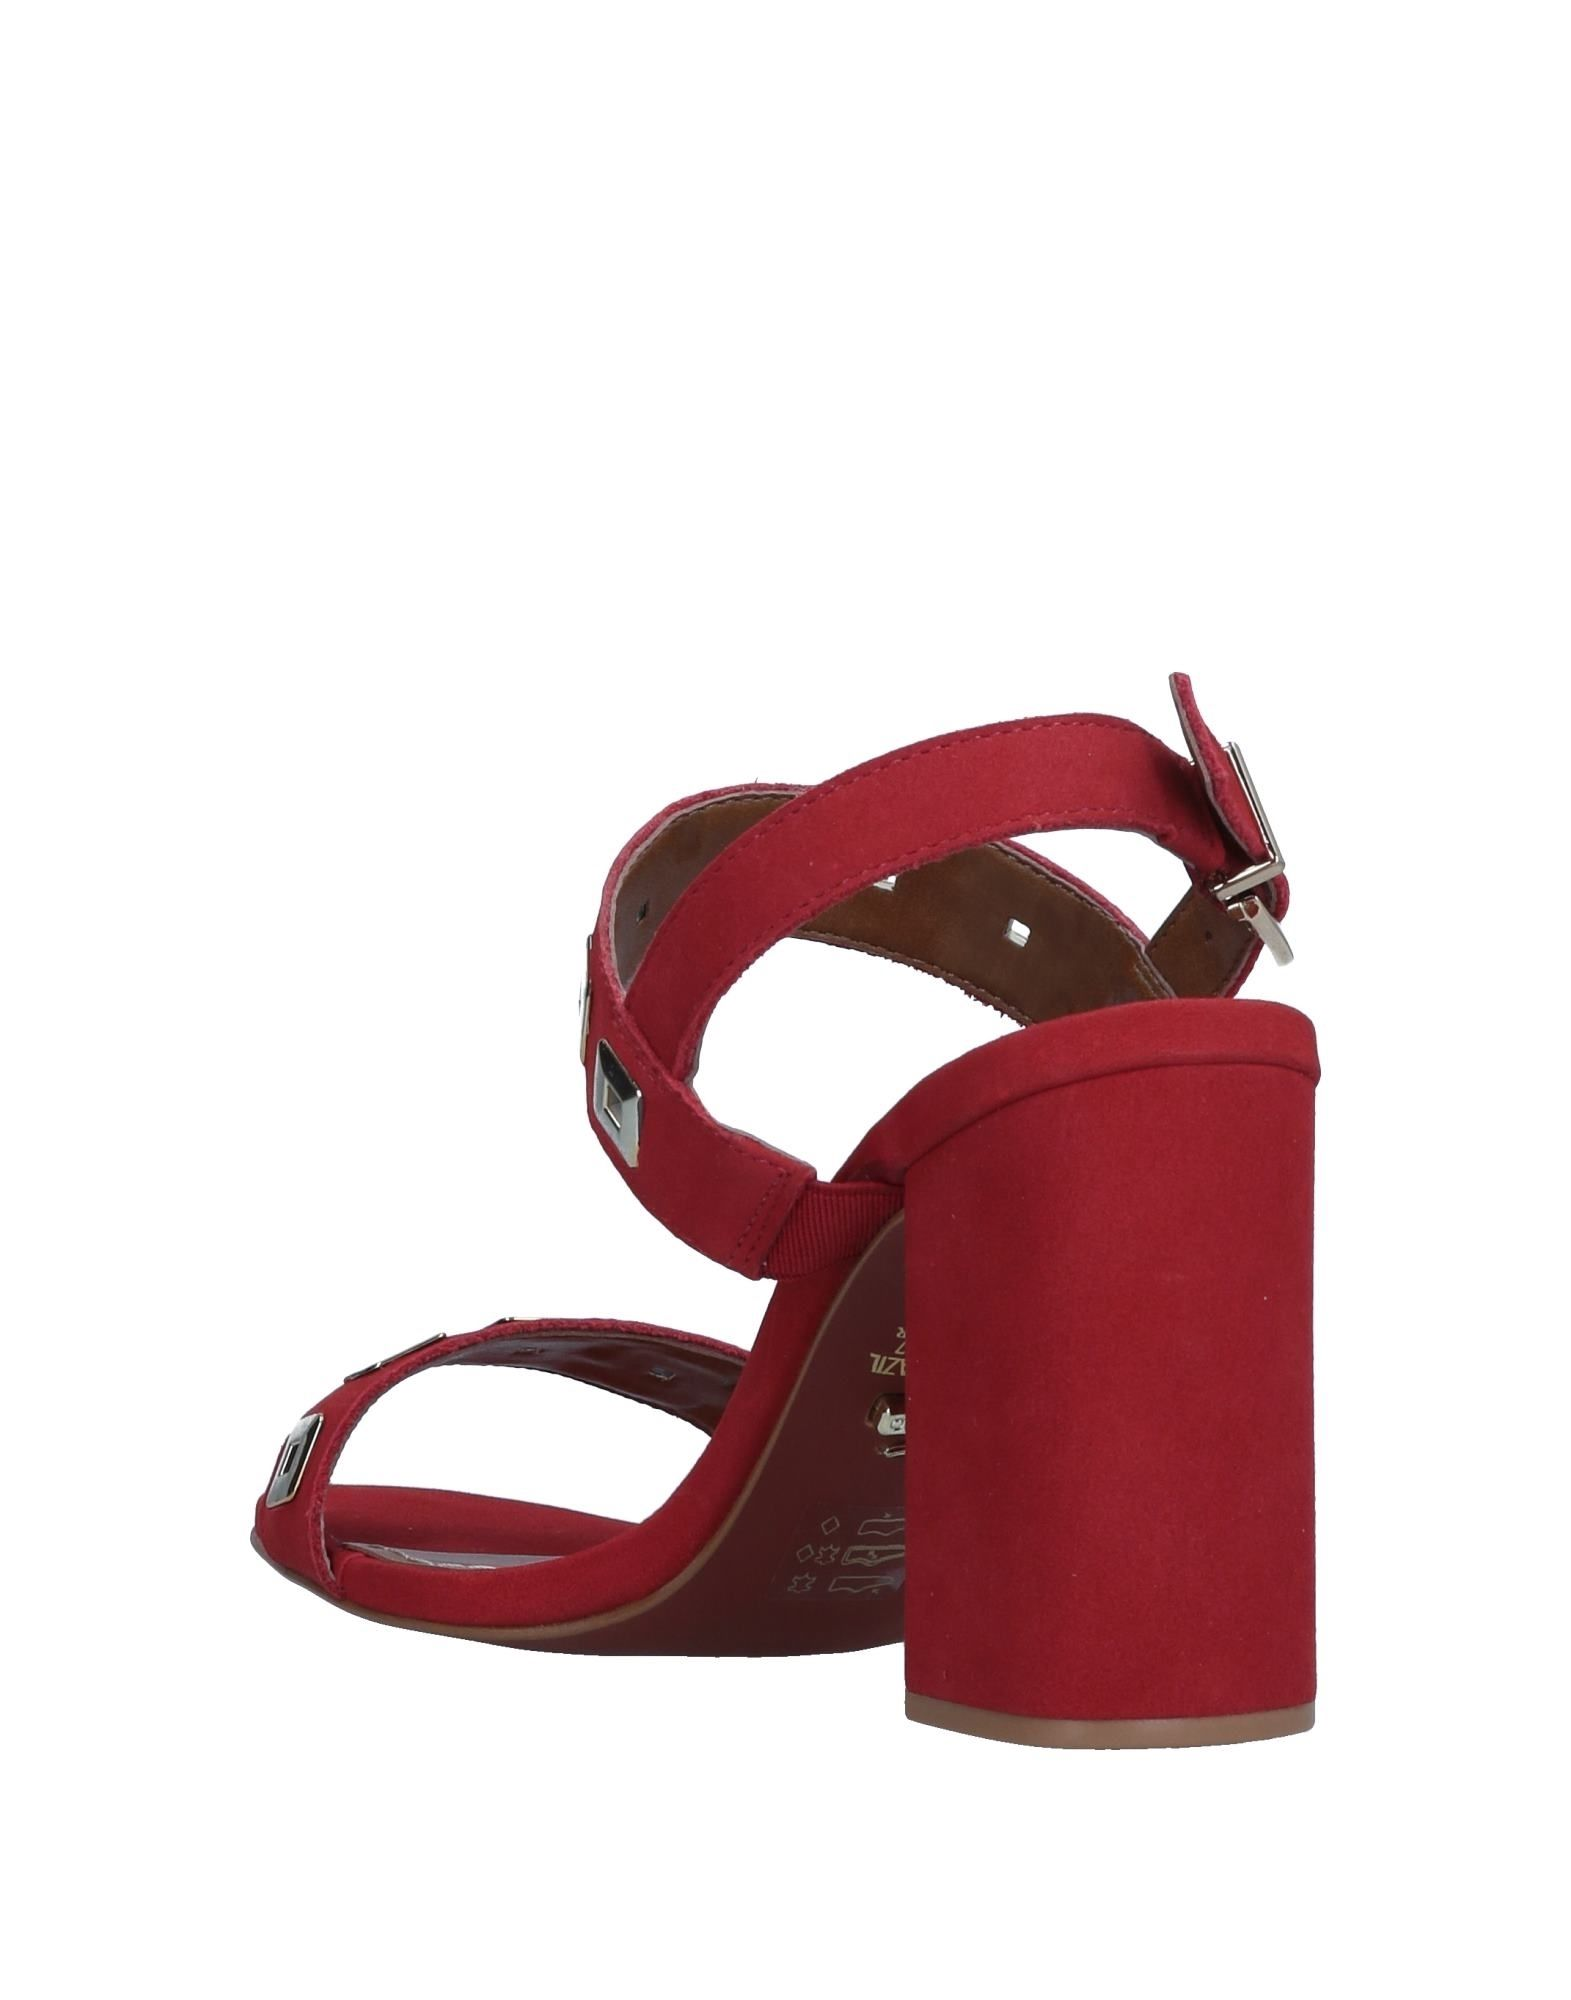 Carrano Schuhe Sandalen Damen  11268641GE Gute Qualität beliebte Schuhe Carrano 6810c4